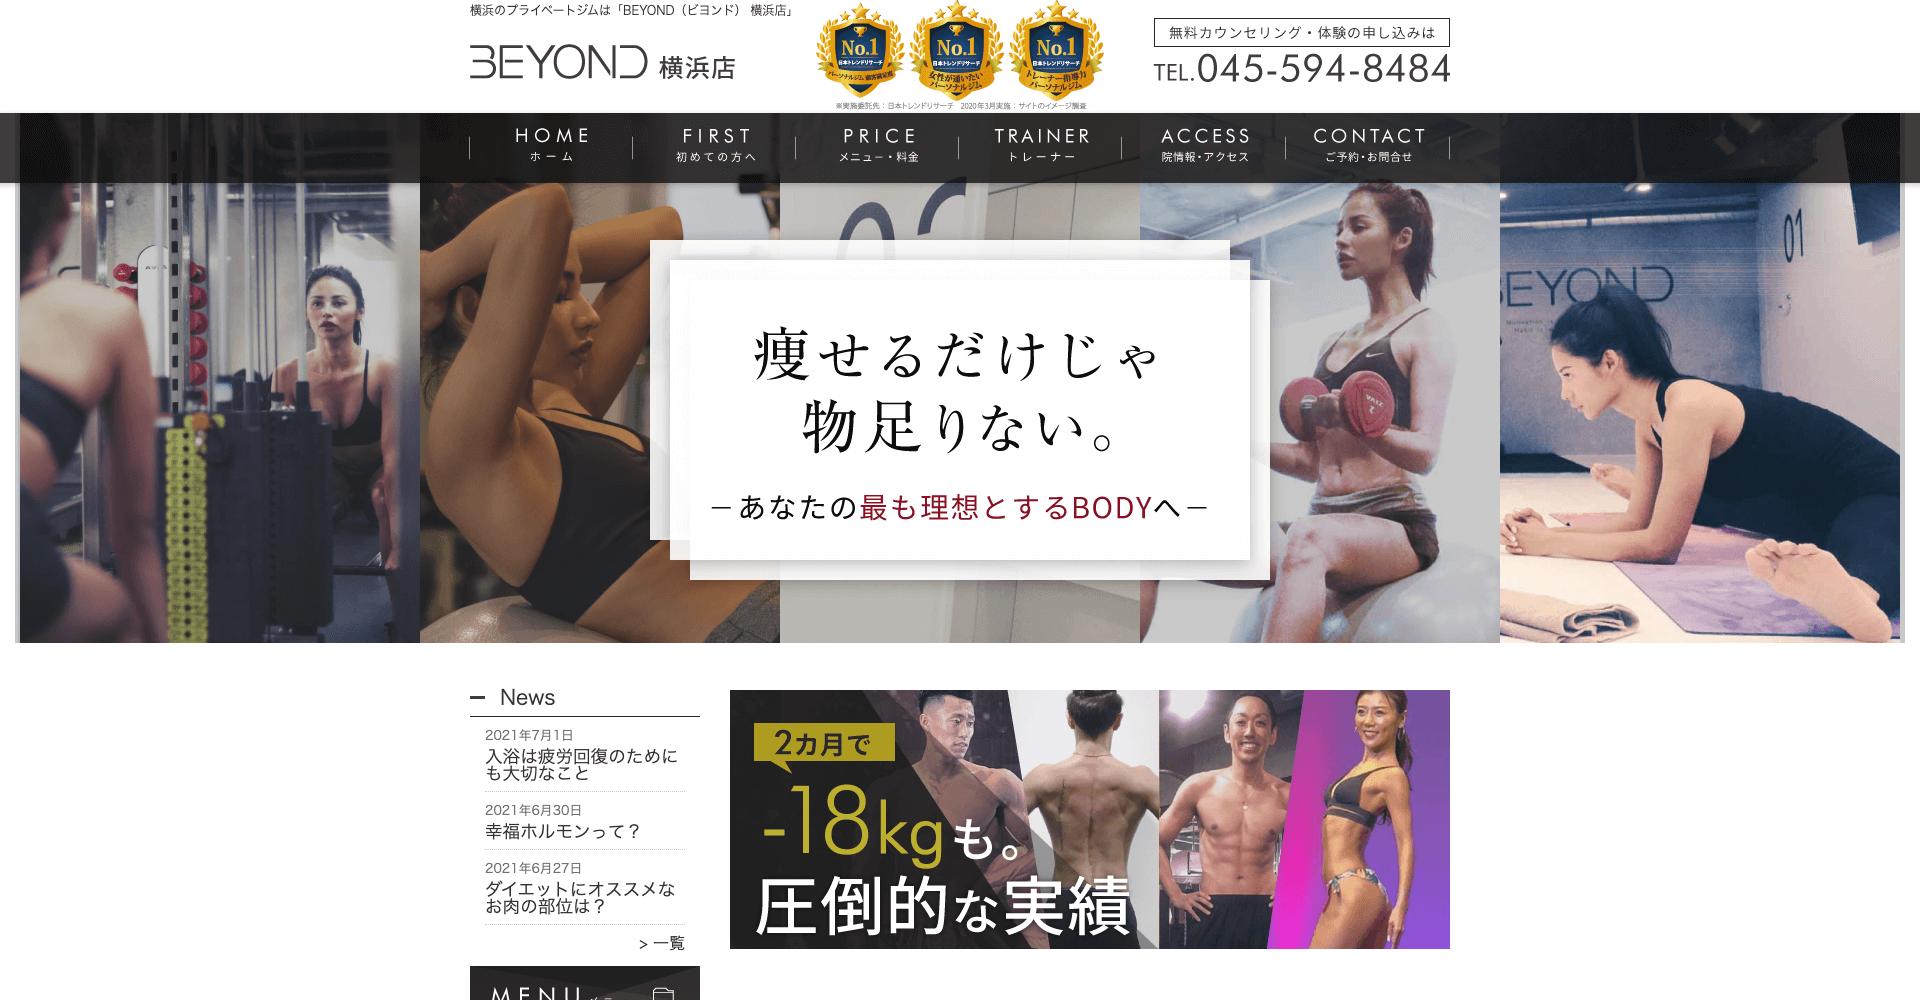 BEYOND(ビヨンド)ジム 横浜店